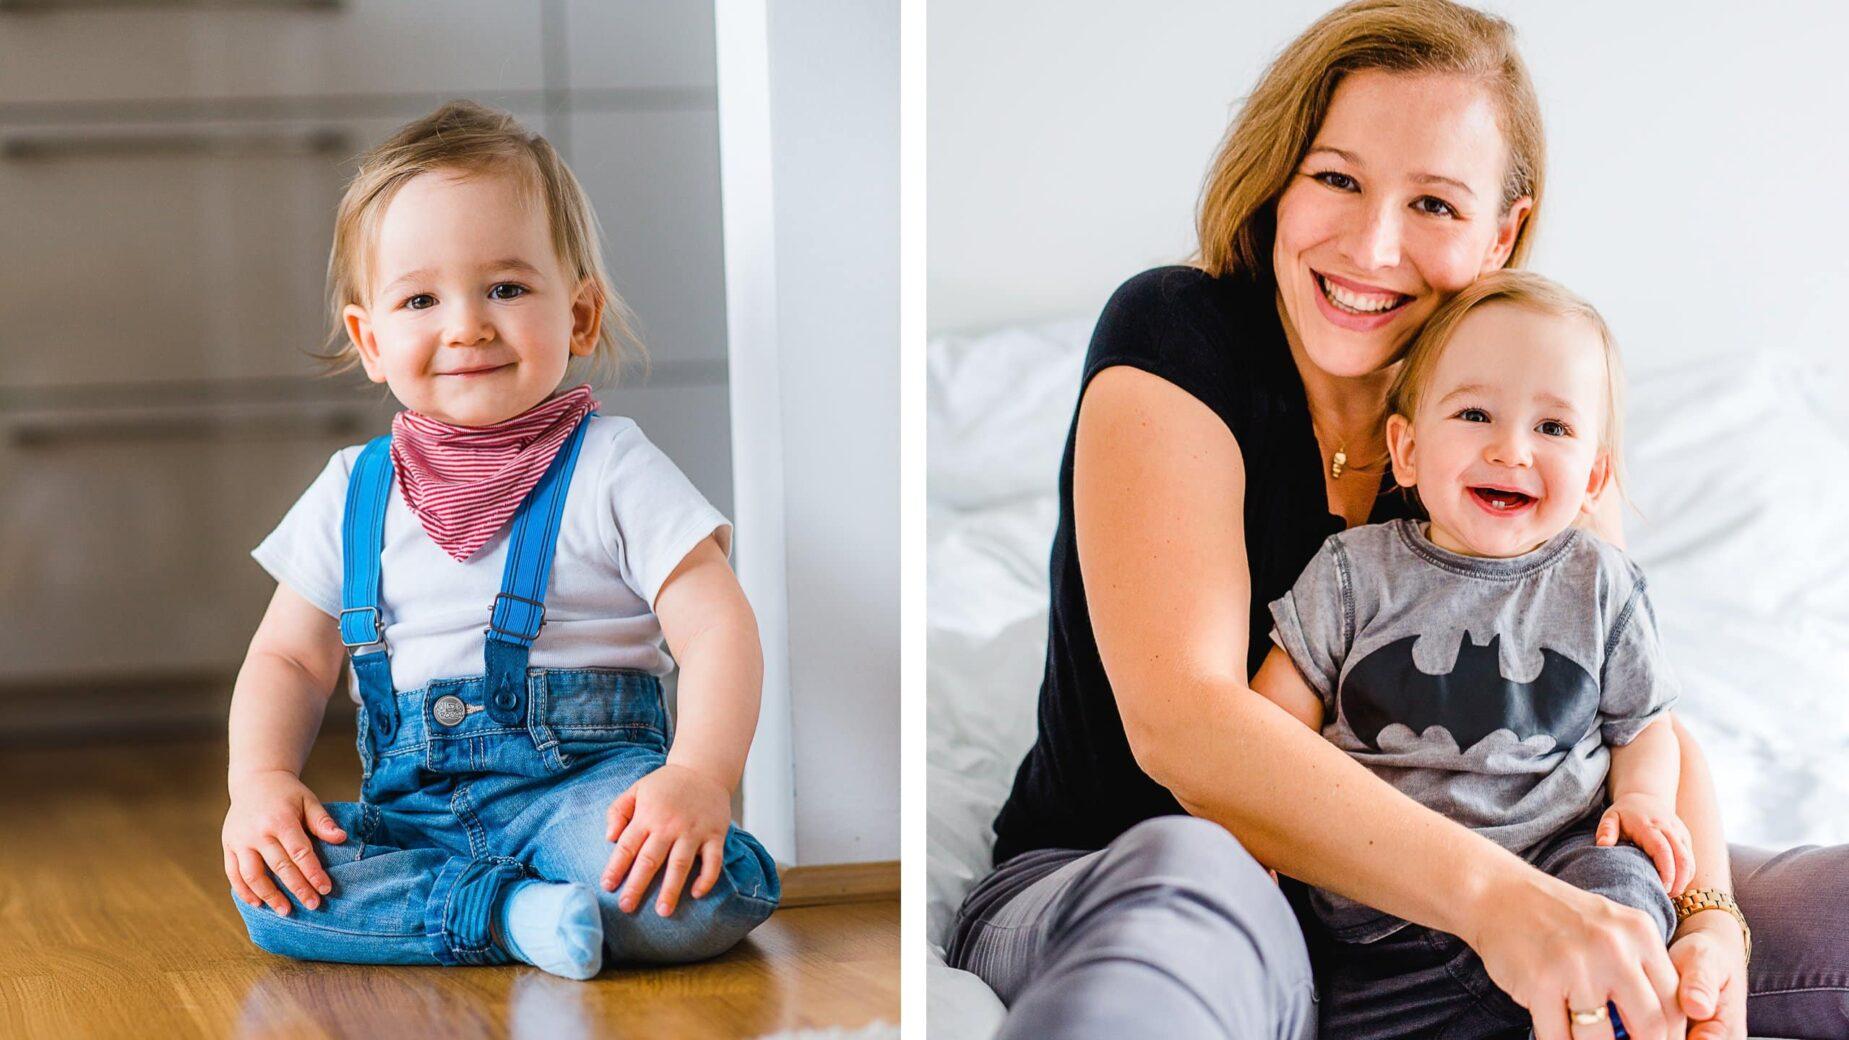 Familienfotos in München, Familyshoot, Kinderfotografie, Homestory